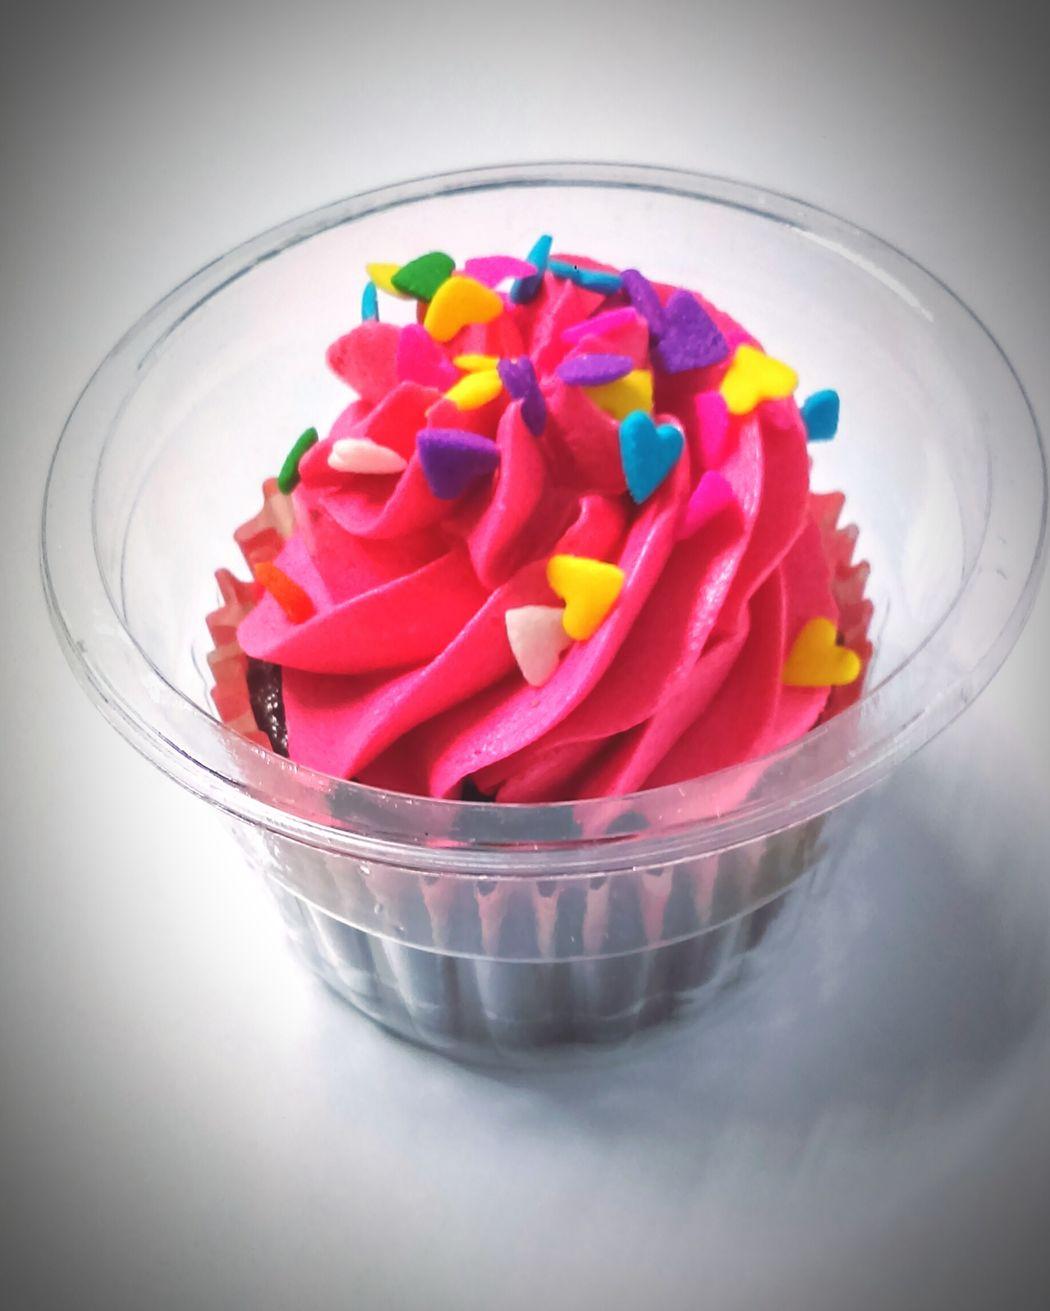 Cupcake Colors Multi Colored Food Fotography Hello EyeEm Gourmetfood That's Me Cocinarte Grastronomy Love It Love ♥ Beautiful Taking Photos Aficionado Sweet Pie